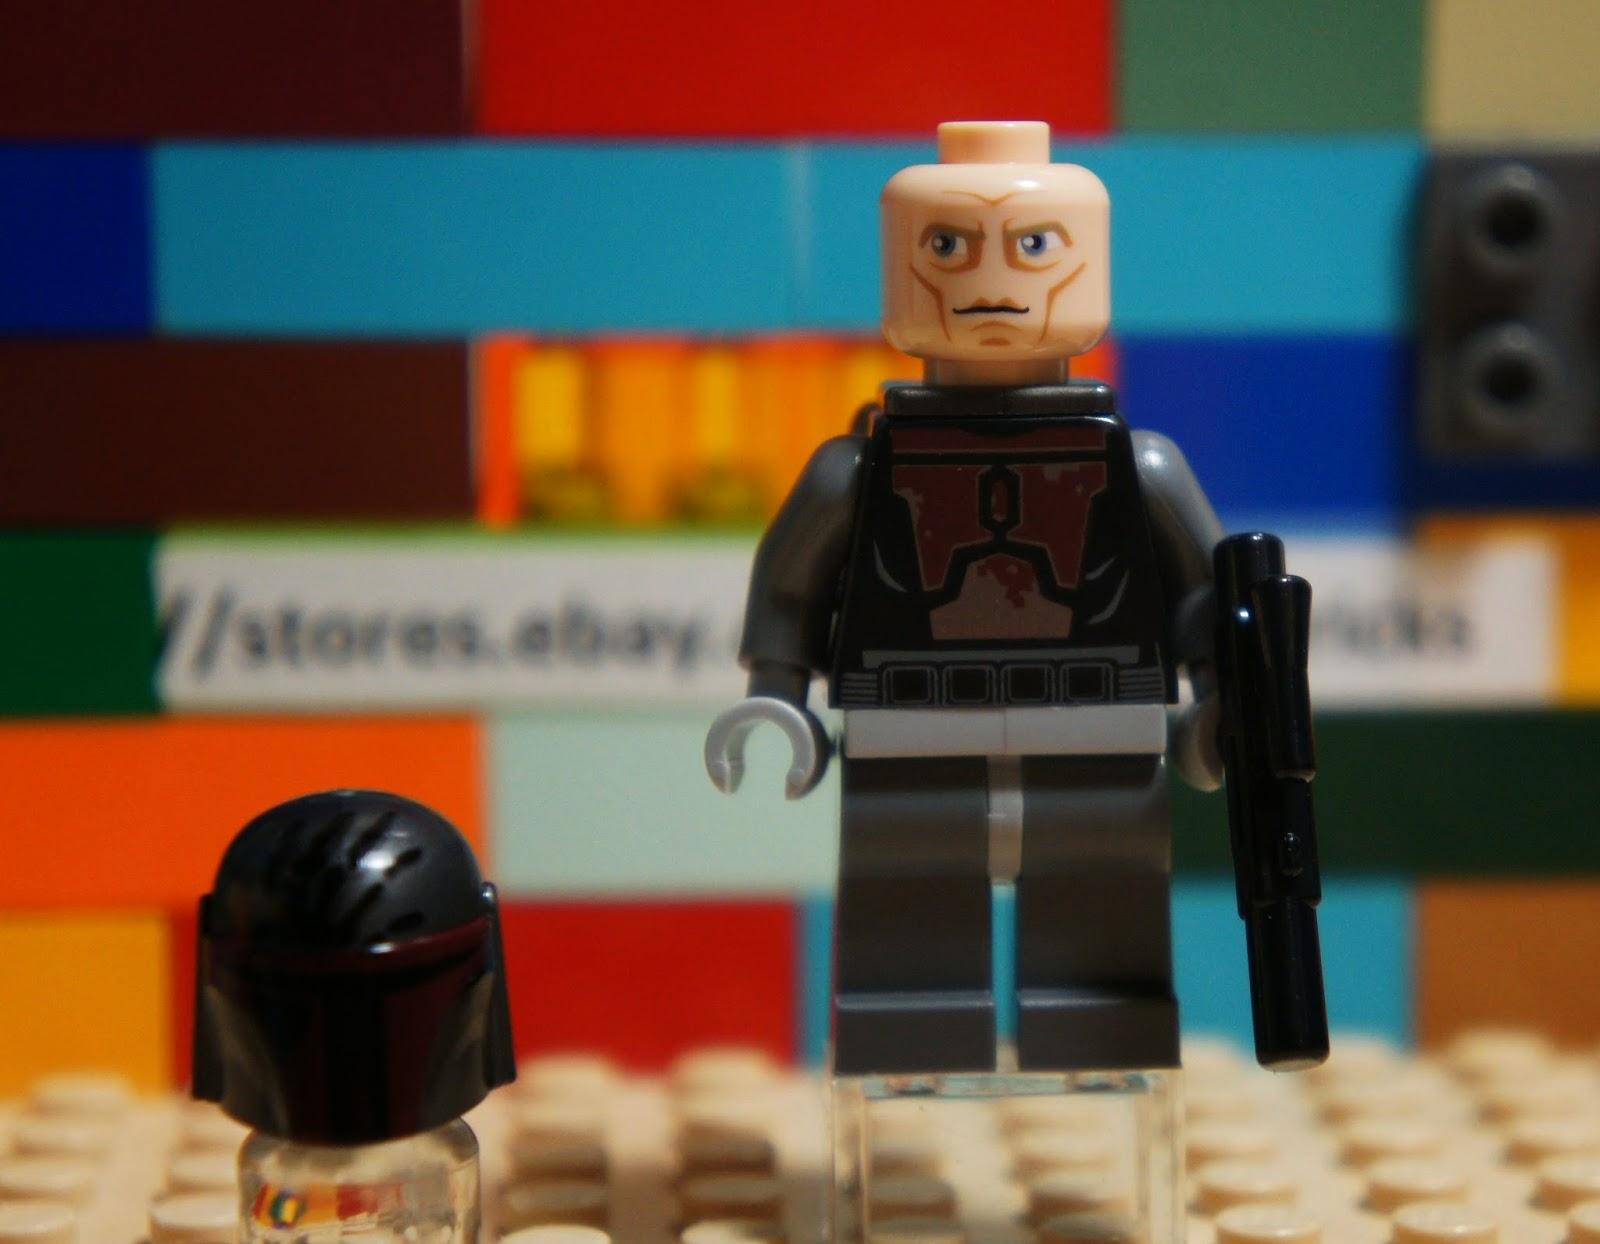 Platforms Stand Lego X2 Tan MOC Mini Raised Round Center Octagonal Plate  Base